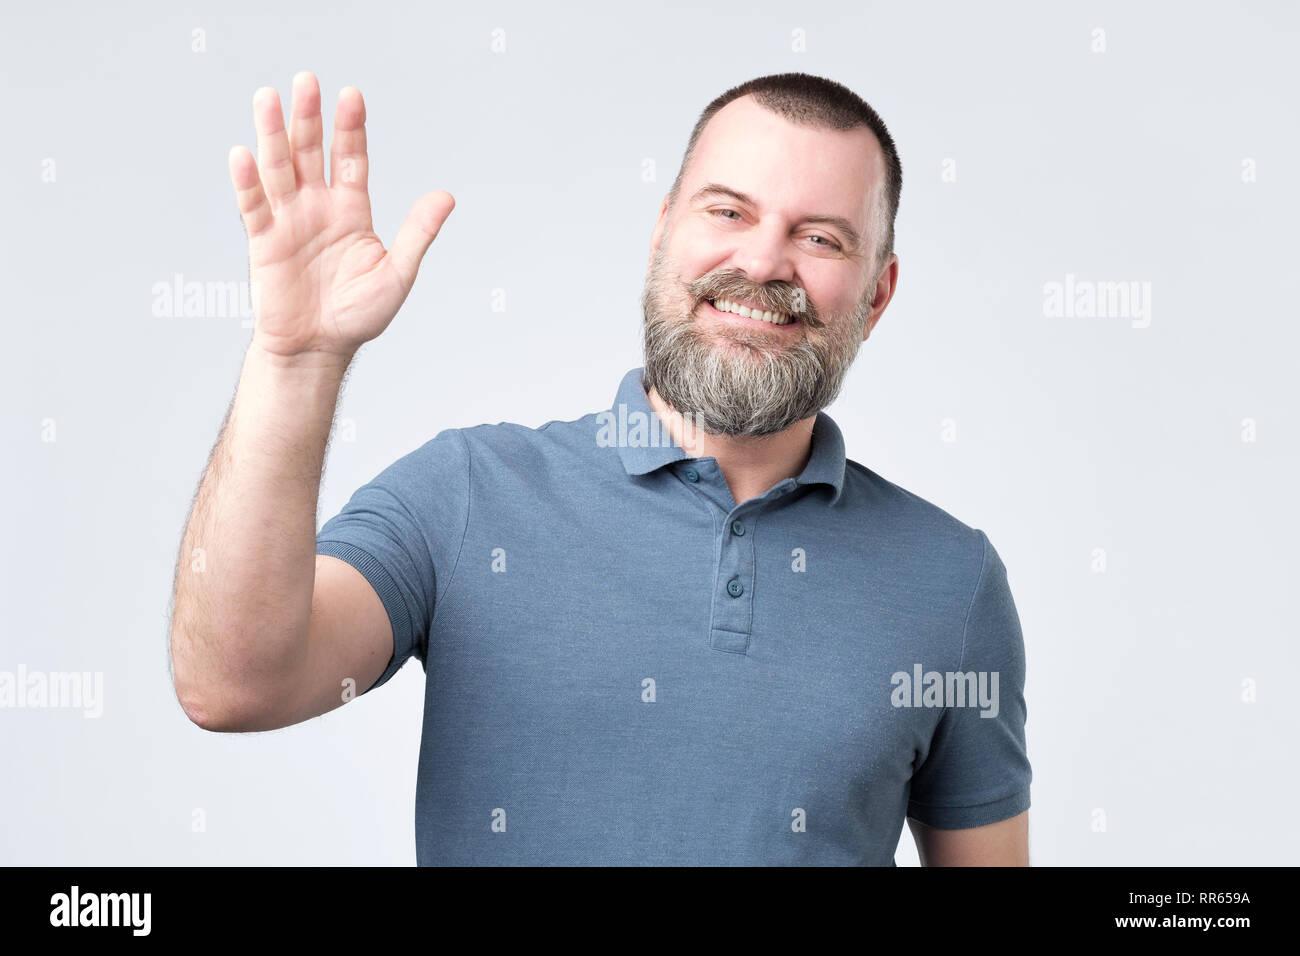 Polite ymature man with beard dressed in denim shirt saying hi, waving with hand - Stock Image